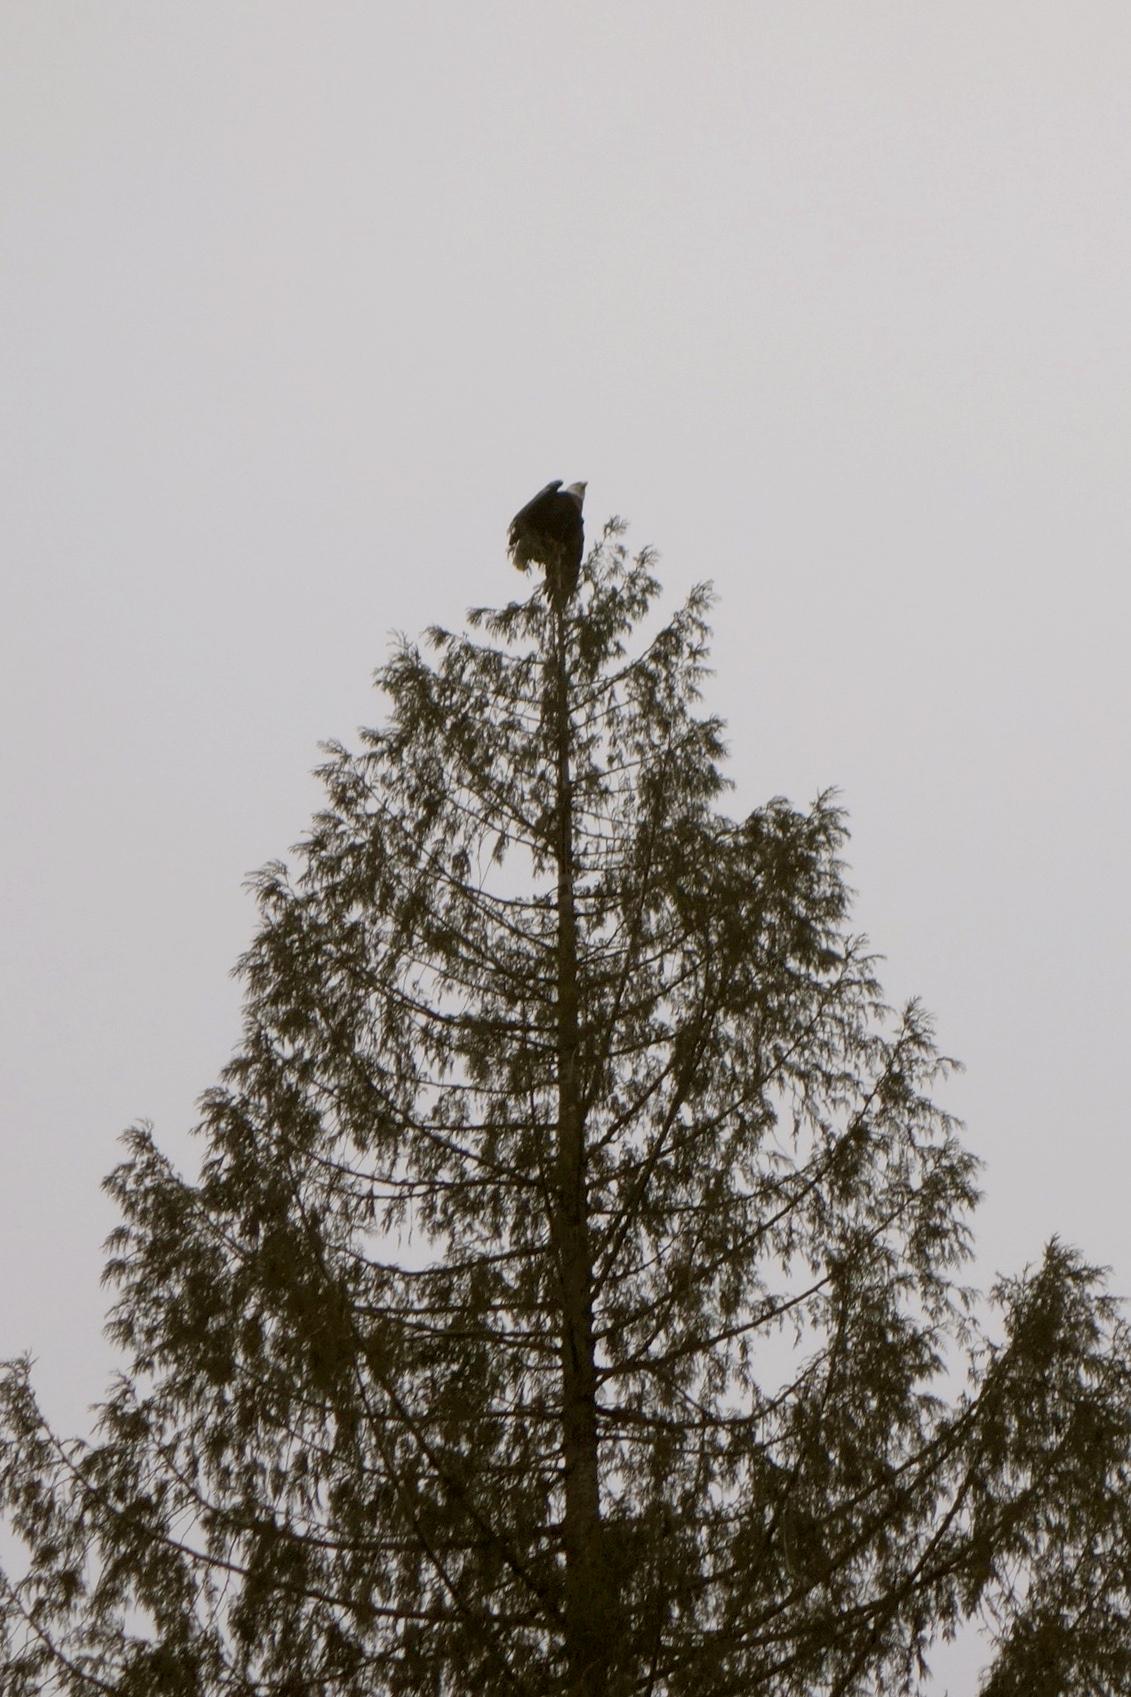 An eagle tops a tree on the Skagit River.Photo © Carol Ingram